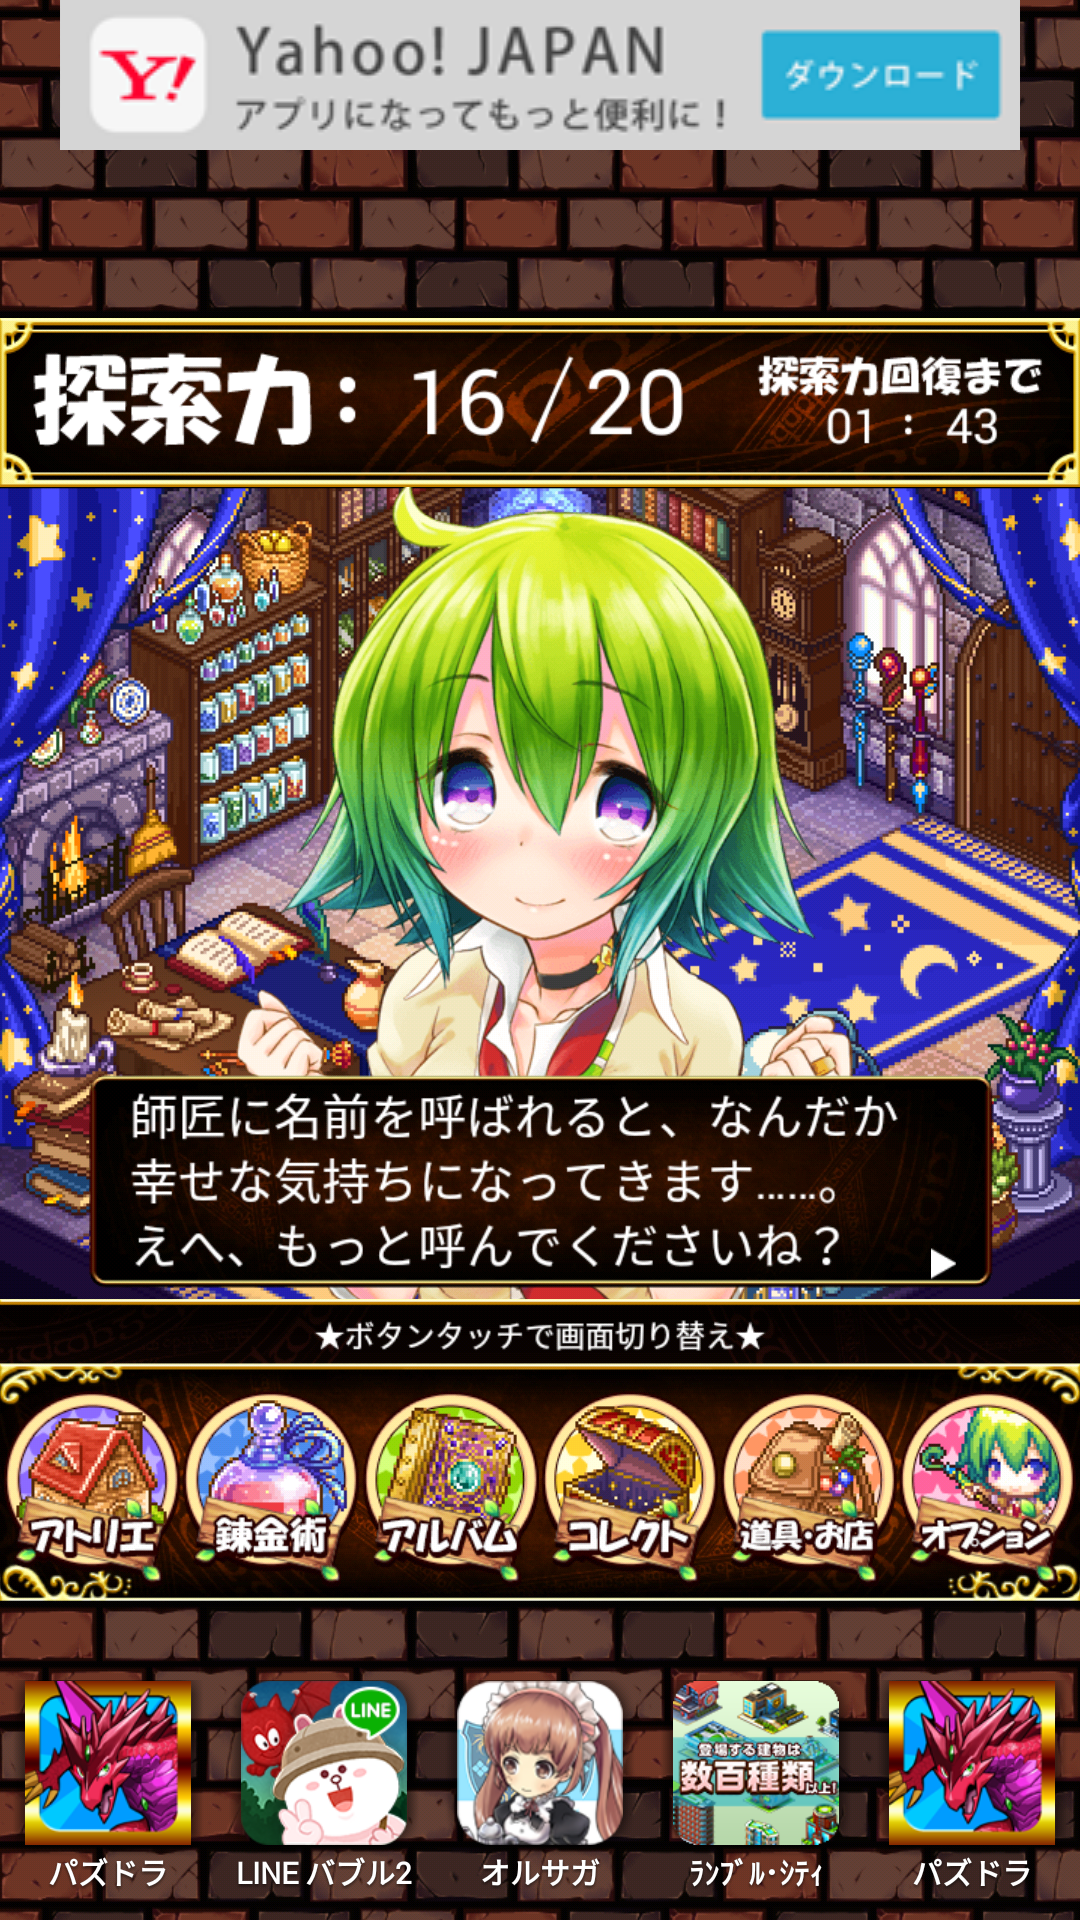 androidアプリ 魔法使いの小さなアトリエ~ティアとセリエの錬金術~攻略スクリーンショット6